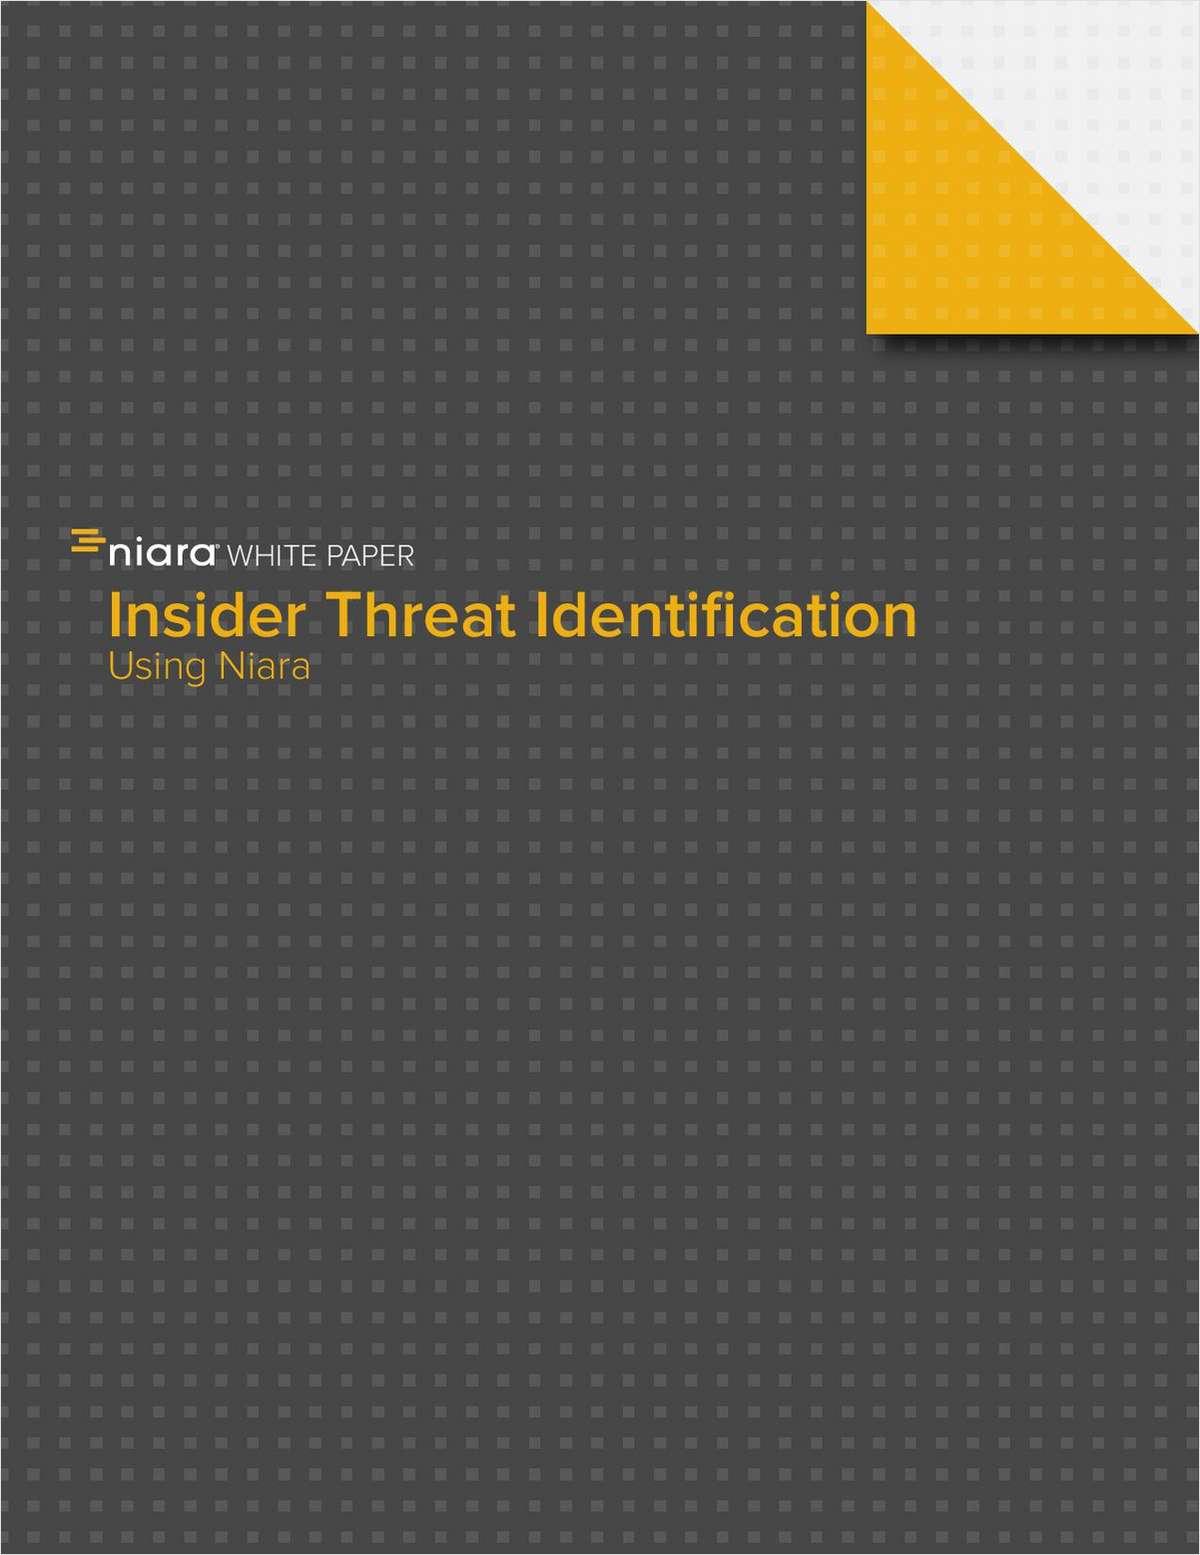 Malicious Insider & Negligent Employee Activity Detection